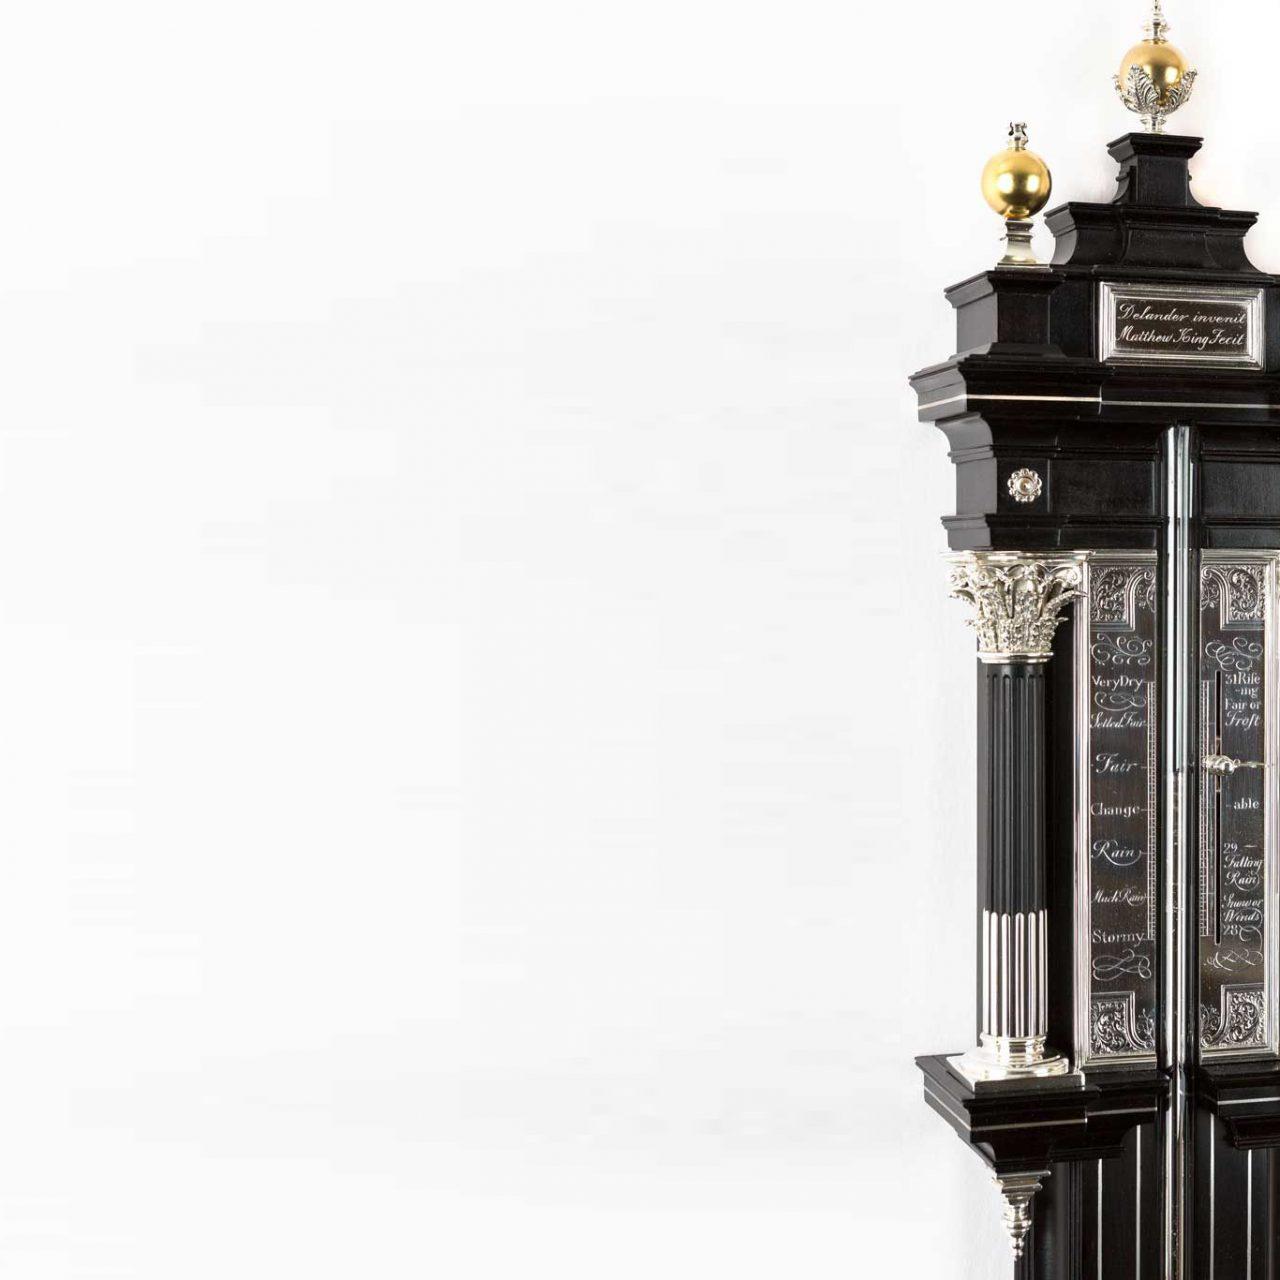 Antiques Expert Reproduces One-of-a-kind Daniel Delander Barometer